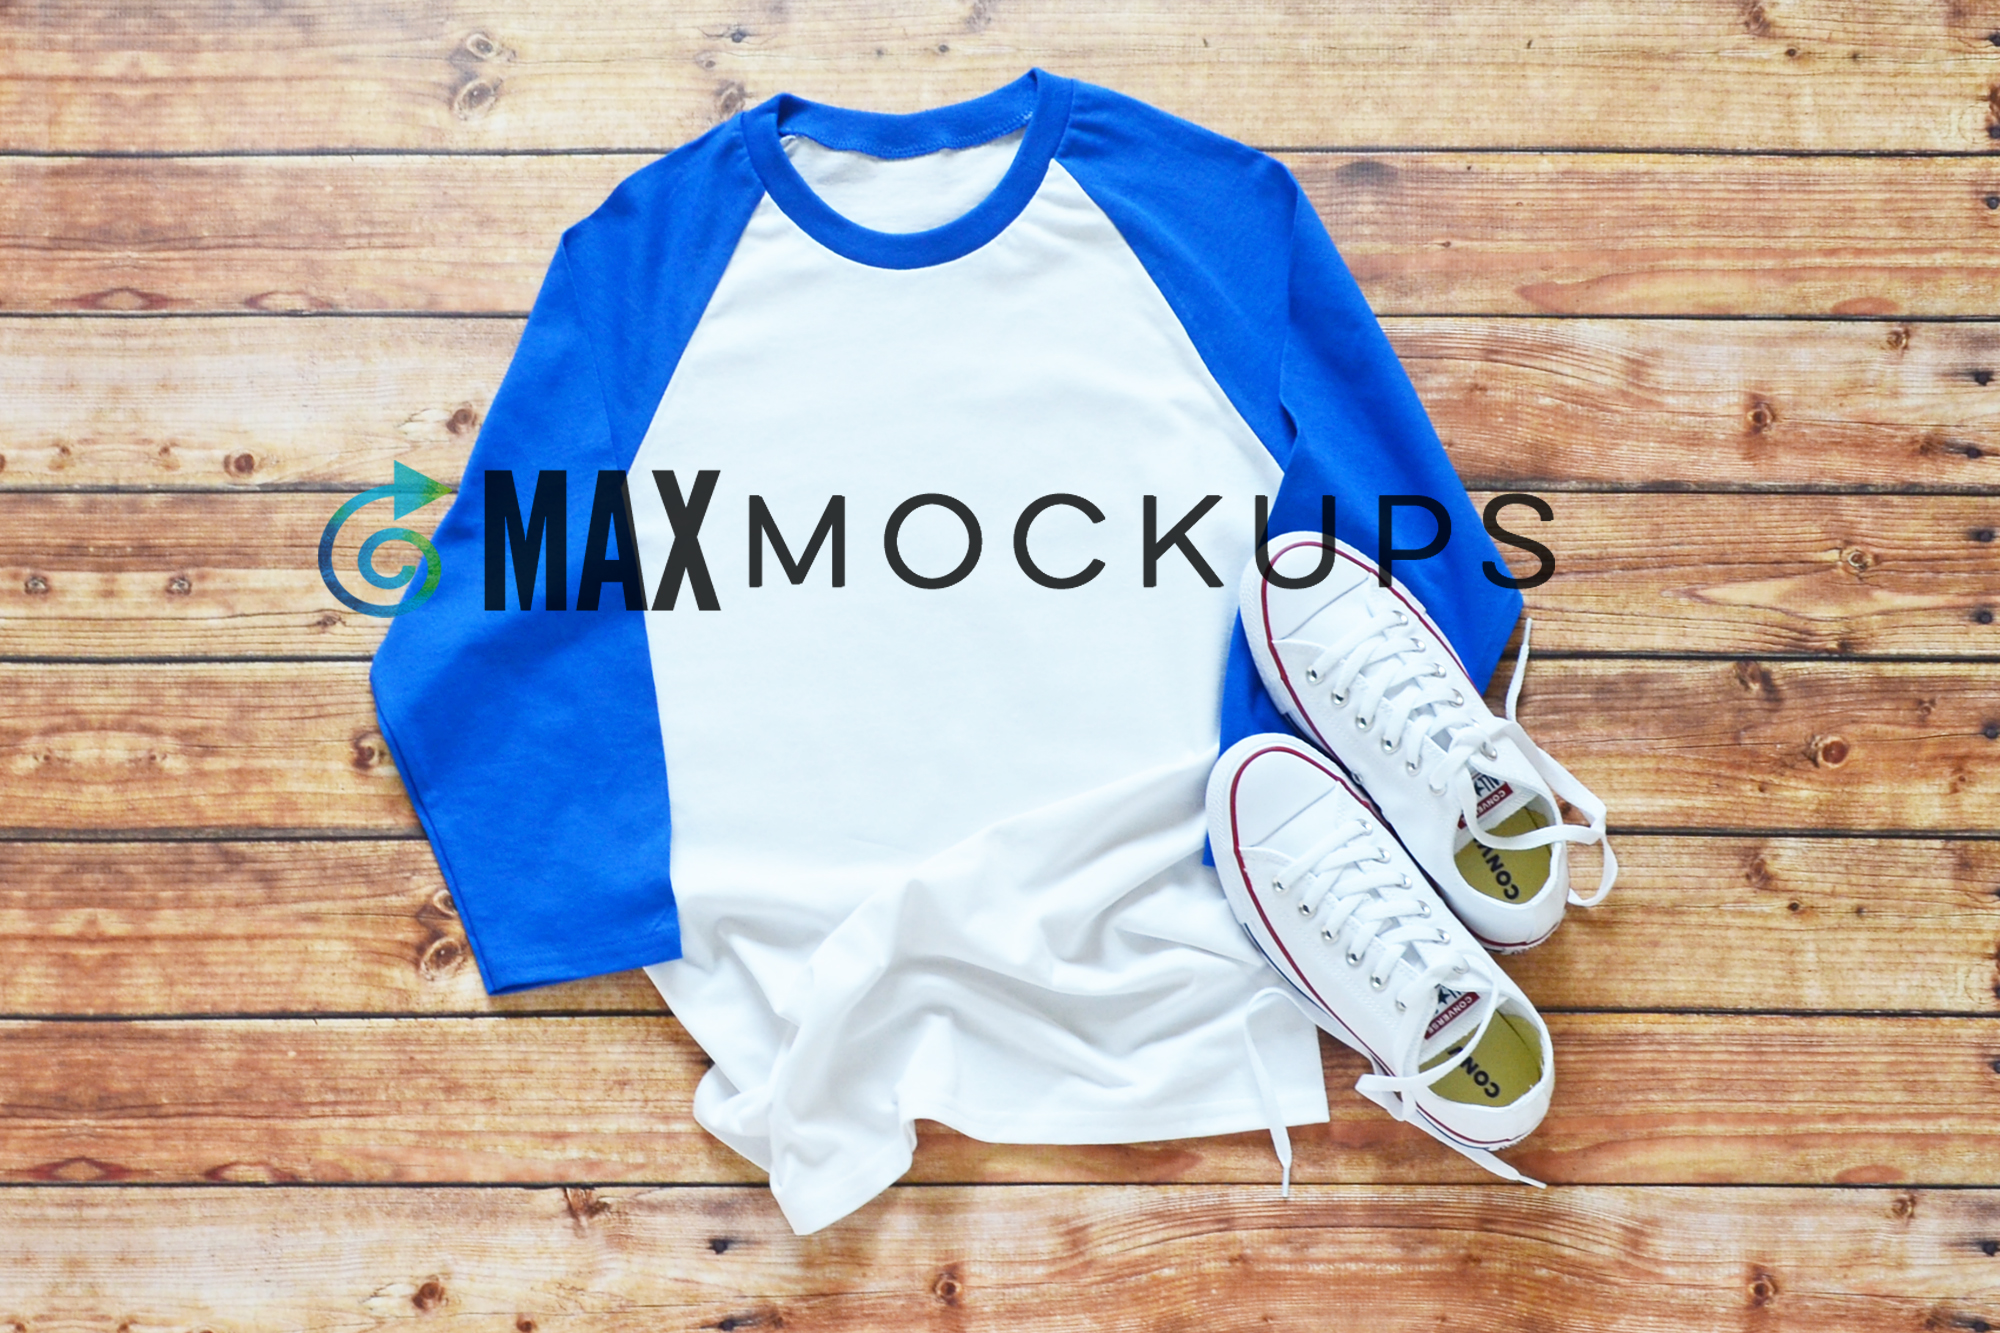 White and blue raglan baseball shirt Mockup, tennis shoes example image 1